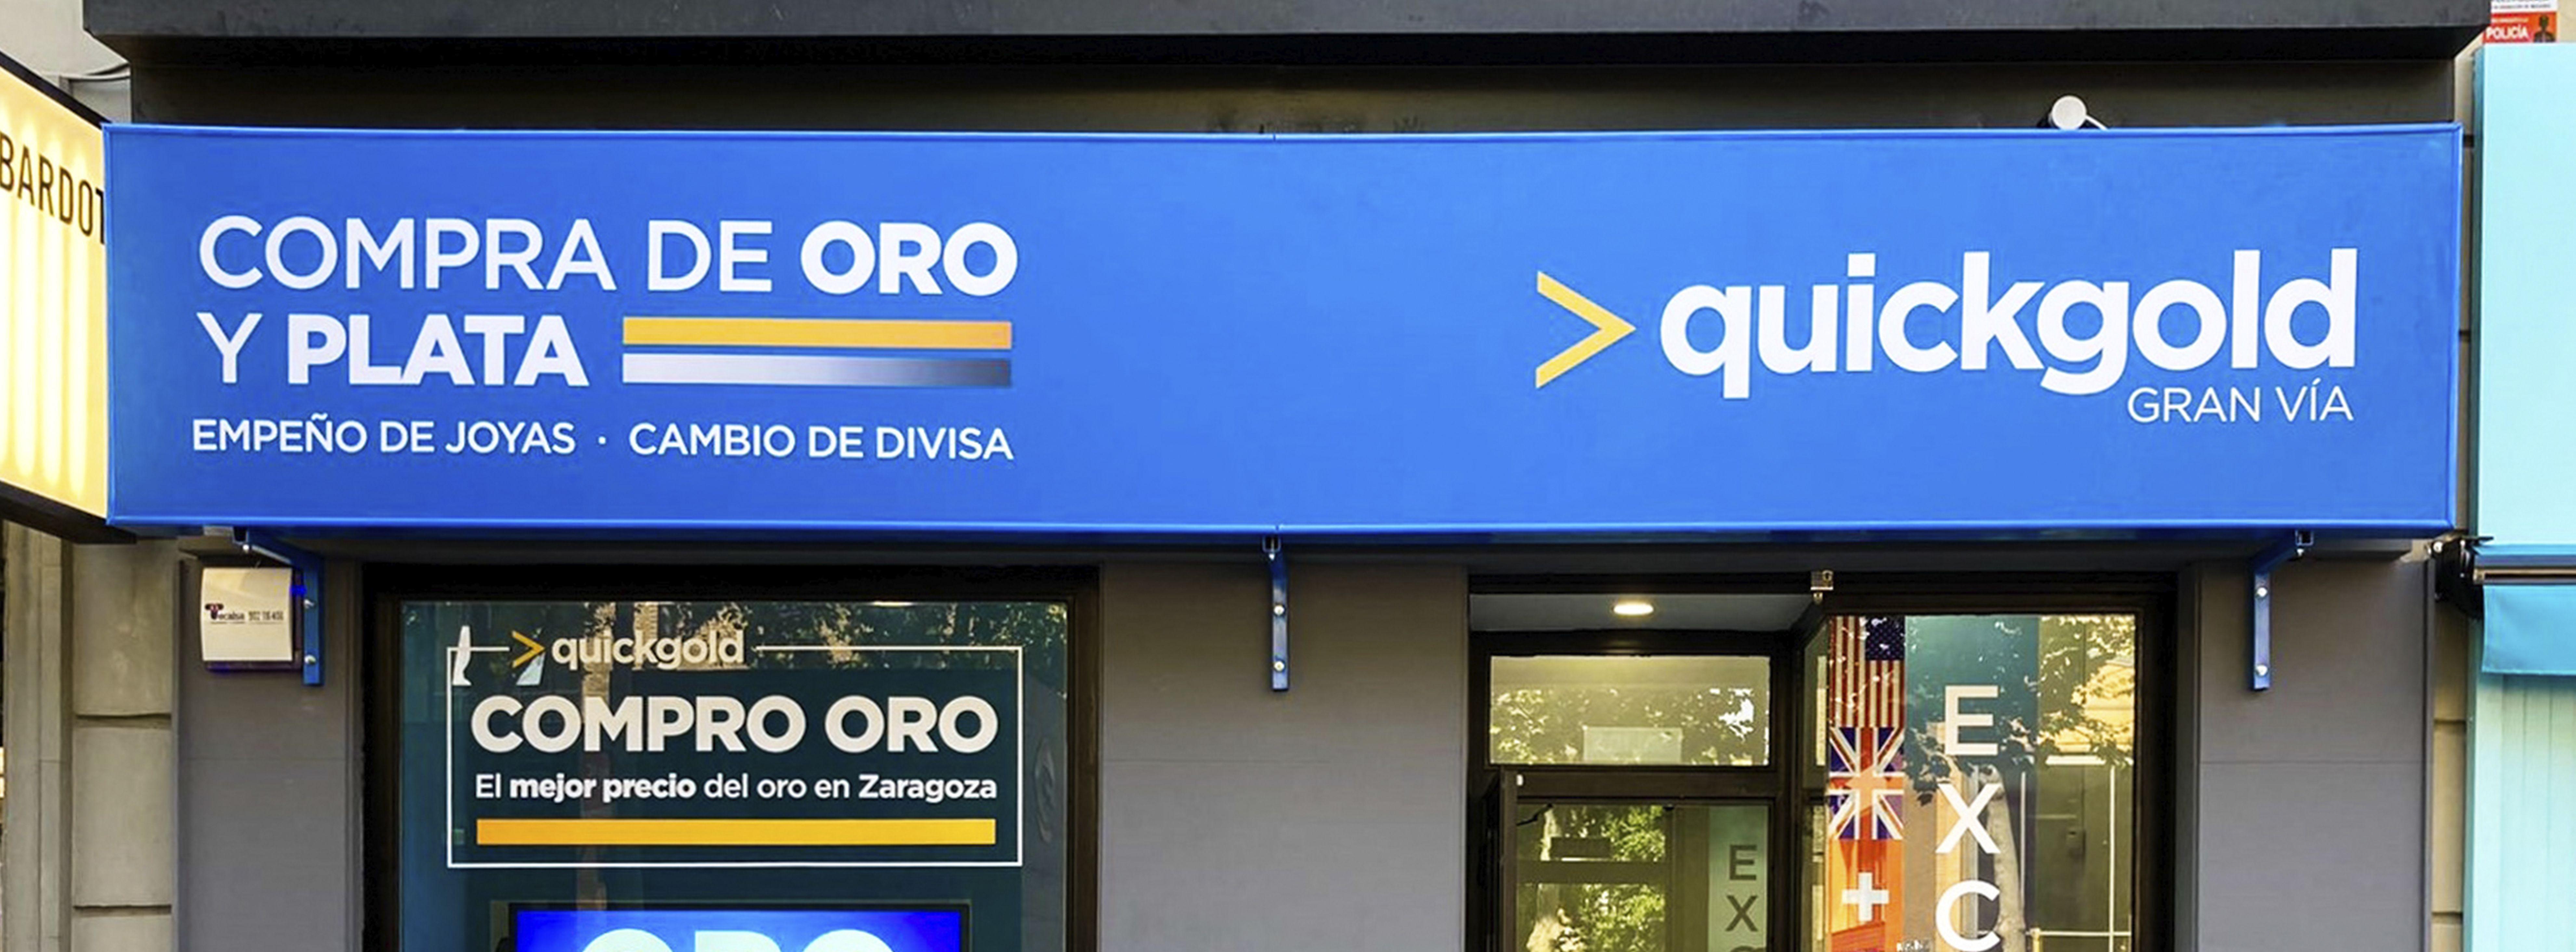 apertura Quickgold Zaragoza Gran Vía exterior fachada quickgold compro oro